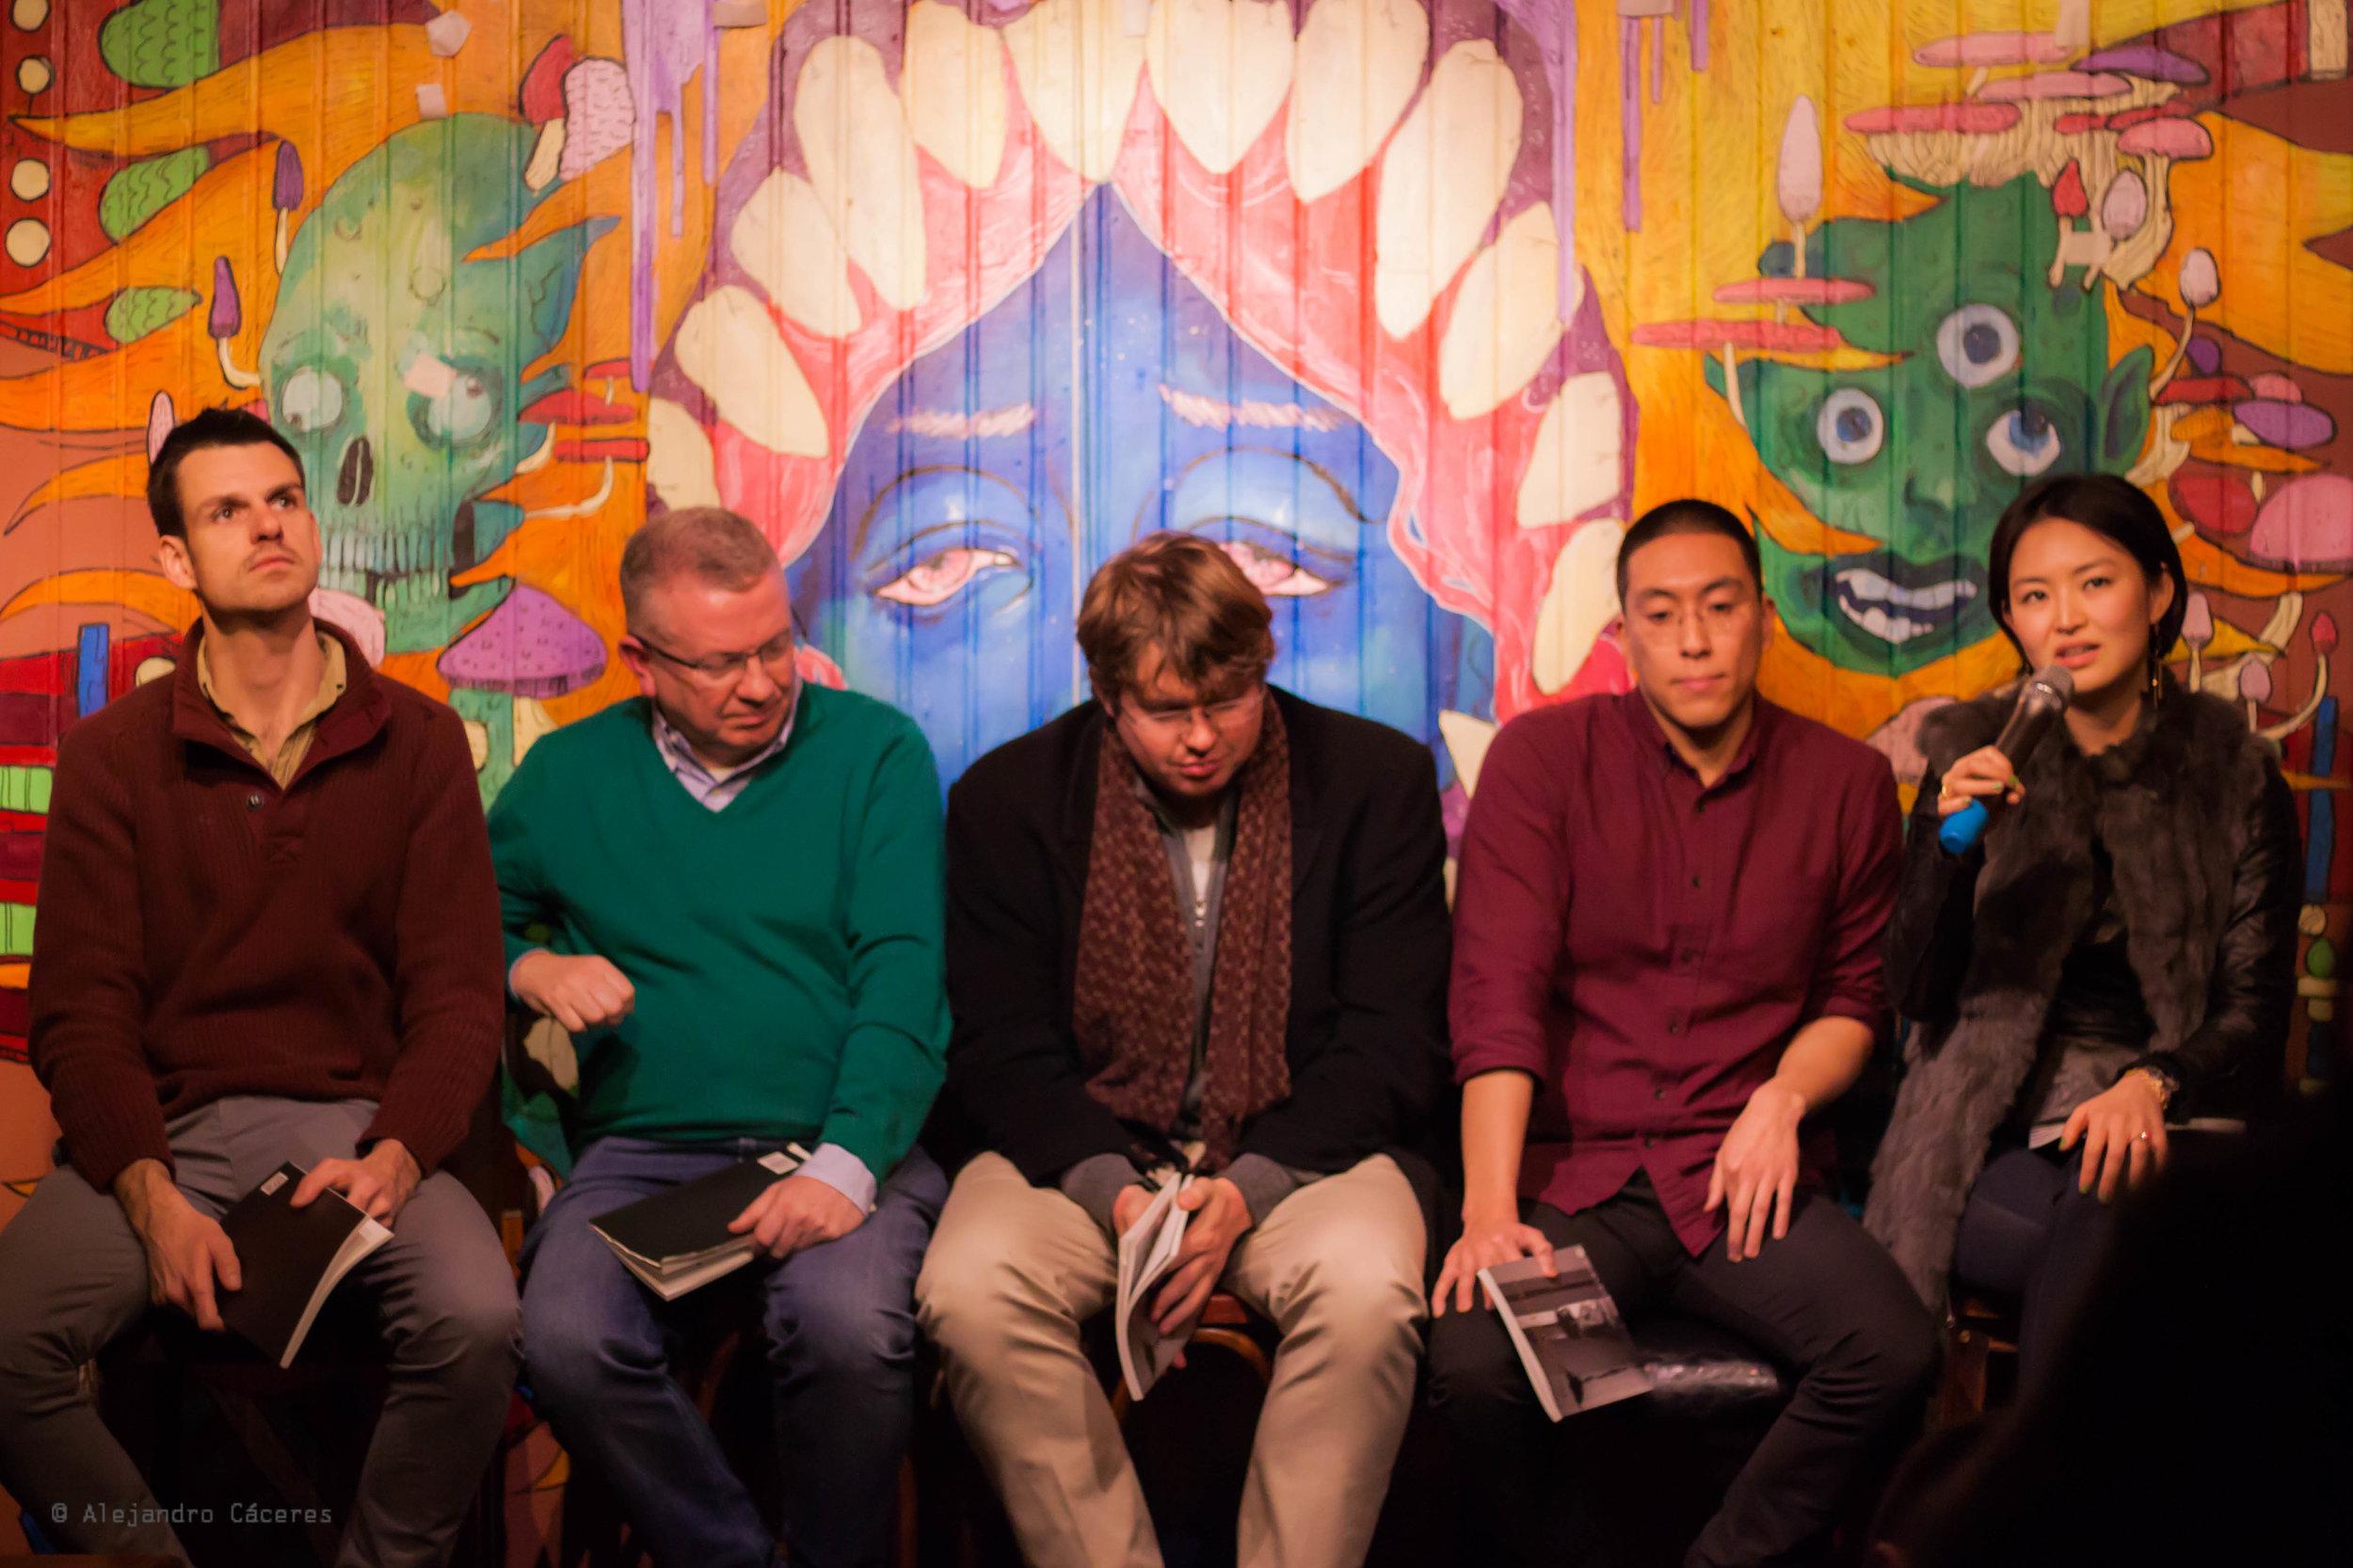 From left to right: Alex Gobin, Colum Murphy, Ryan Thorpe, Kenny Ong, Juli Min